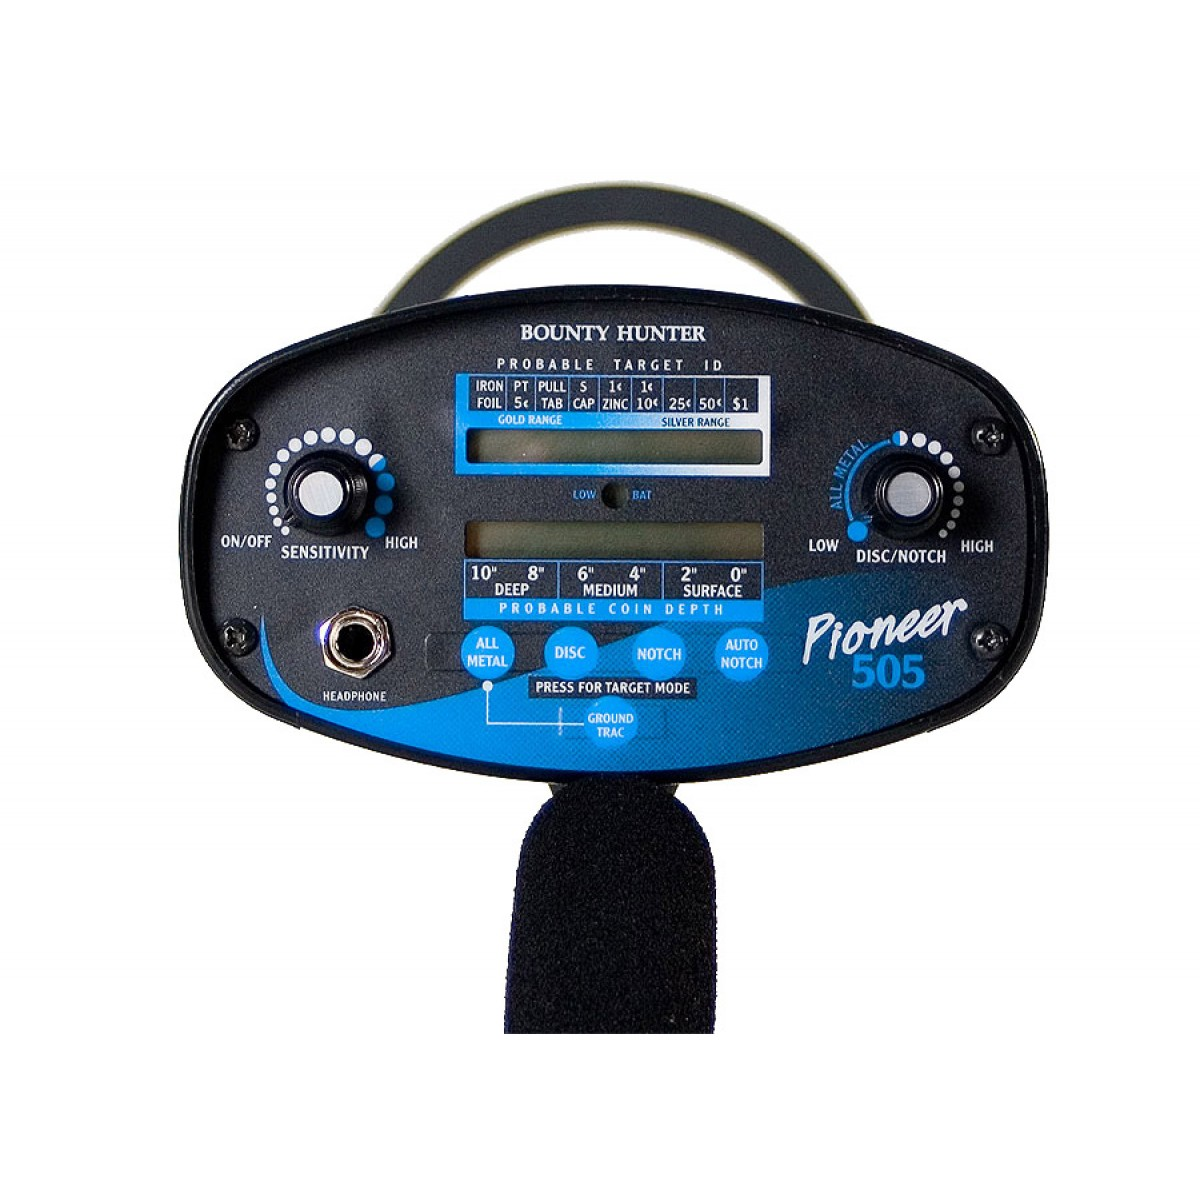 Bounty Hunter Pioneer 505 ground detector